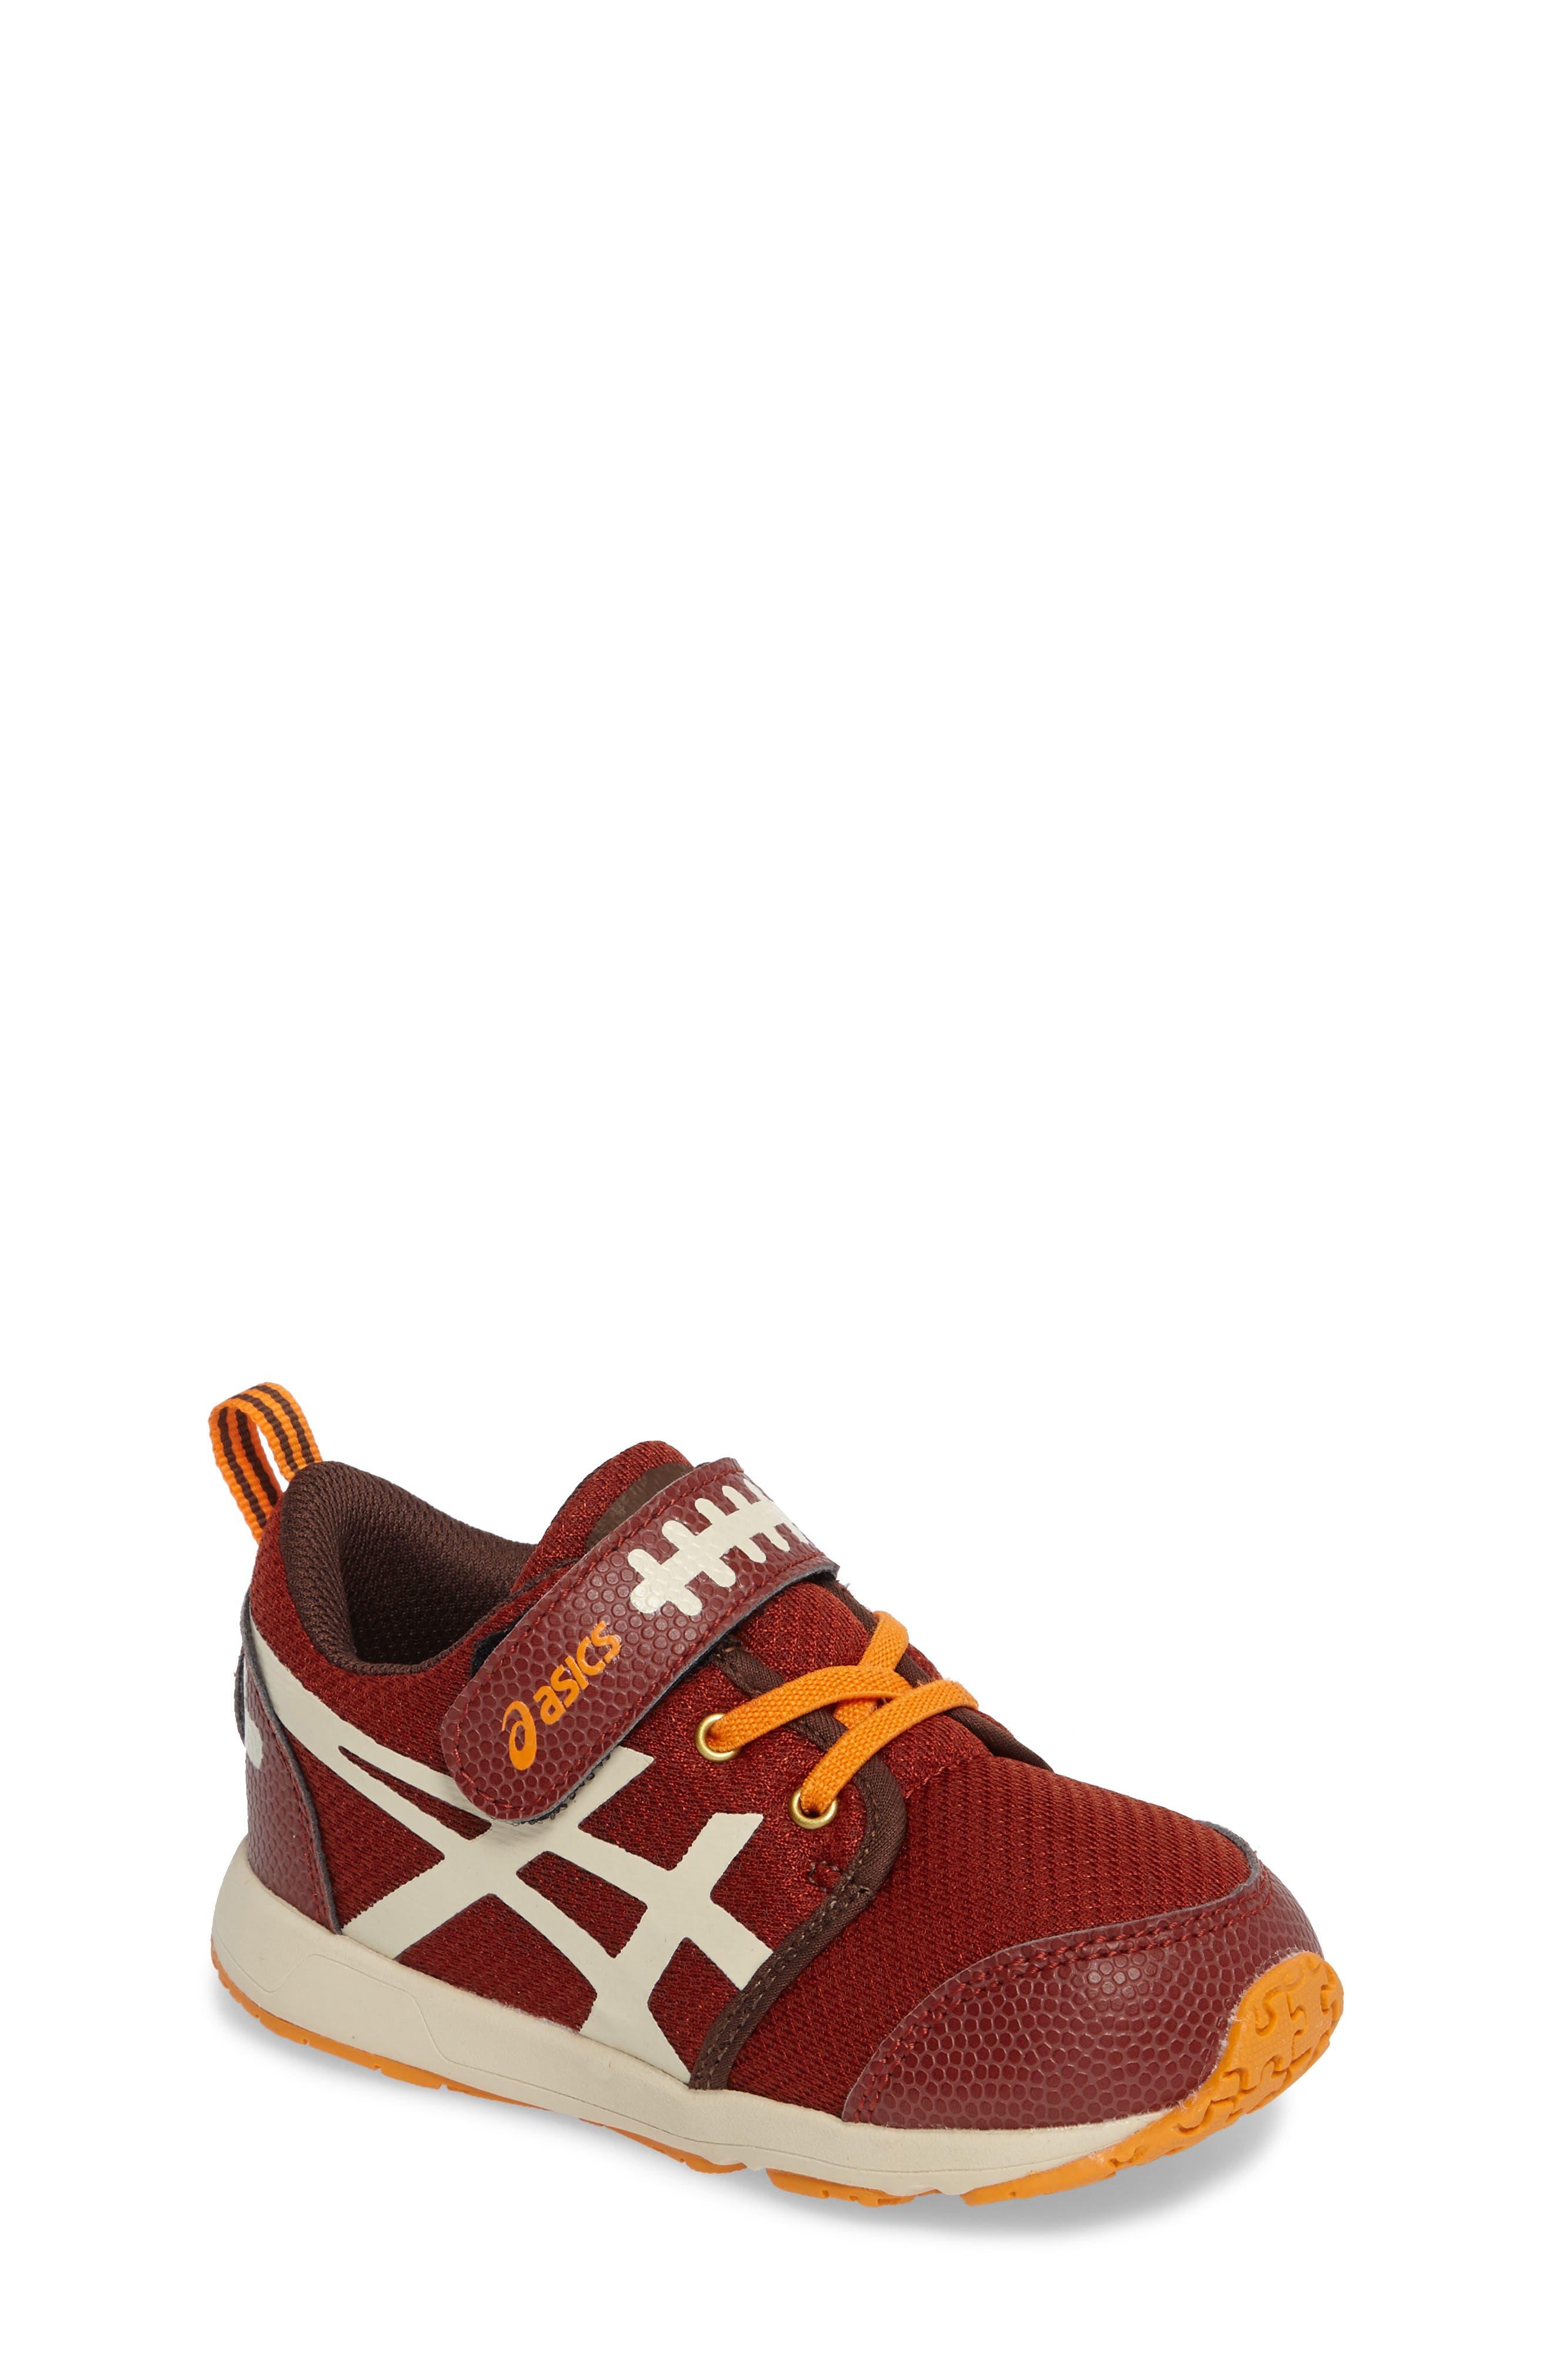 Main Image - ASICS® School Yard™ TS Sneaker (Baby, Walker & Toddler)